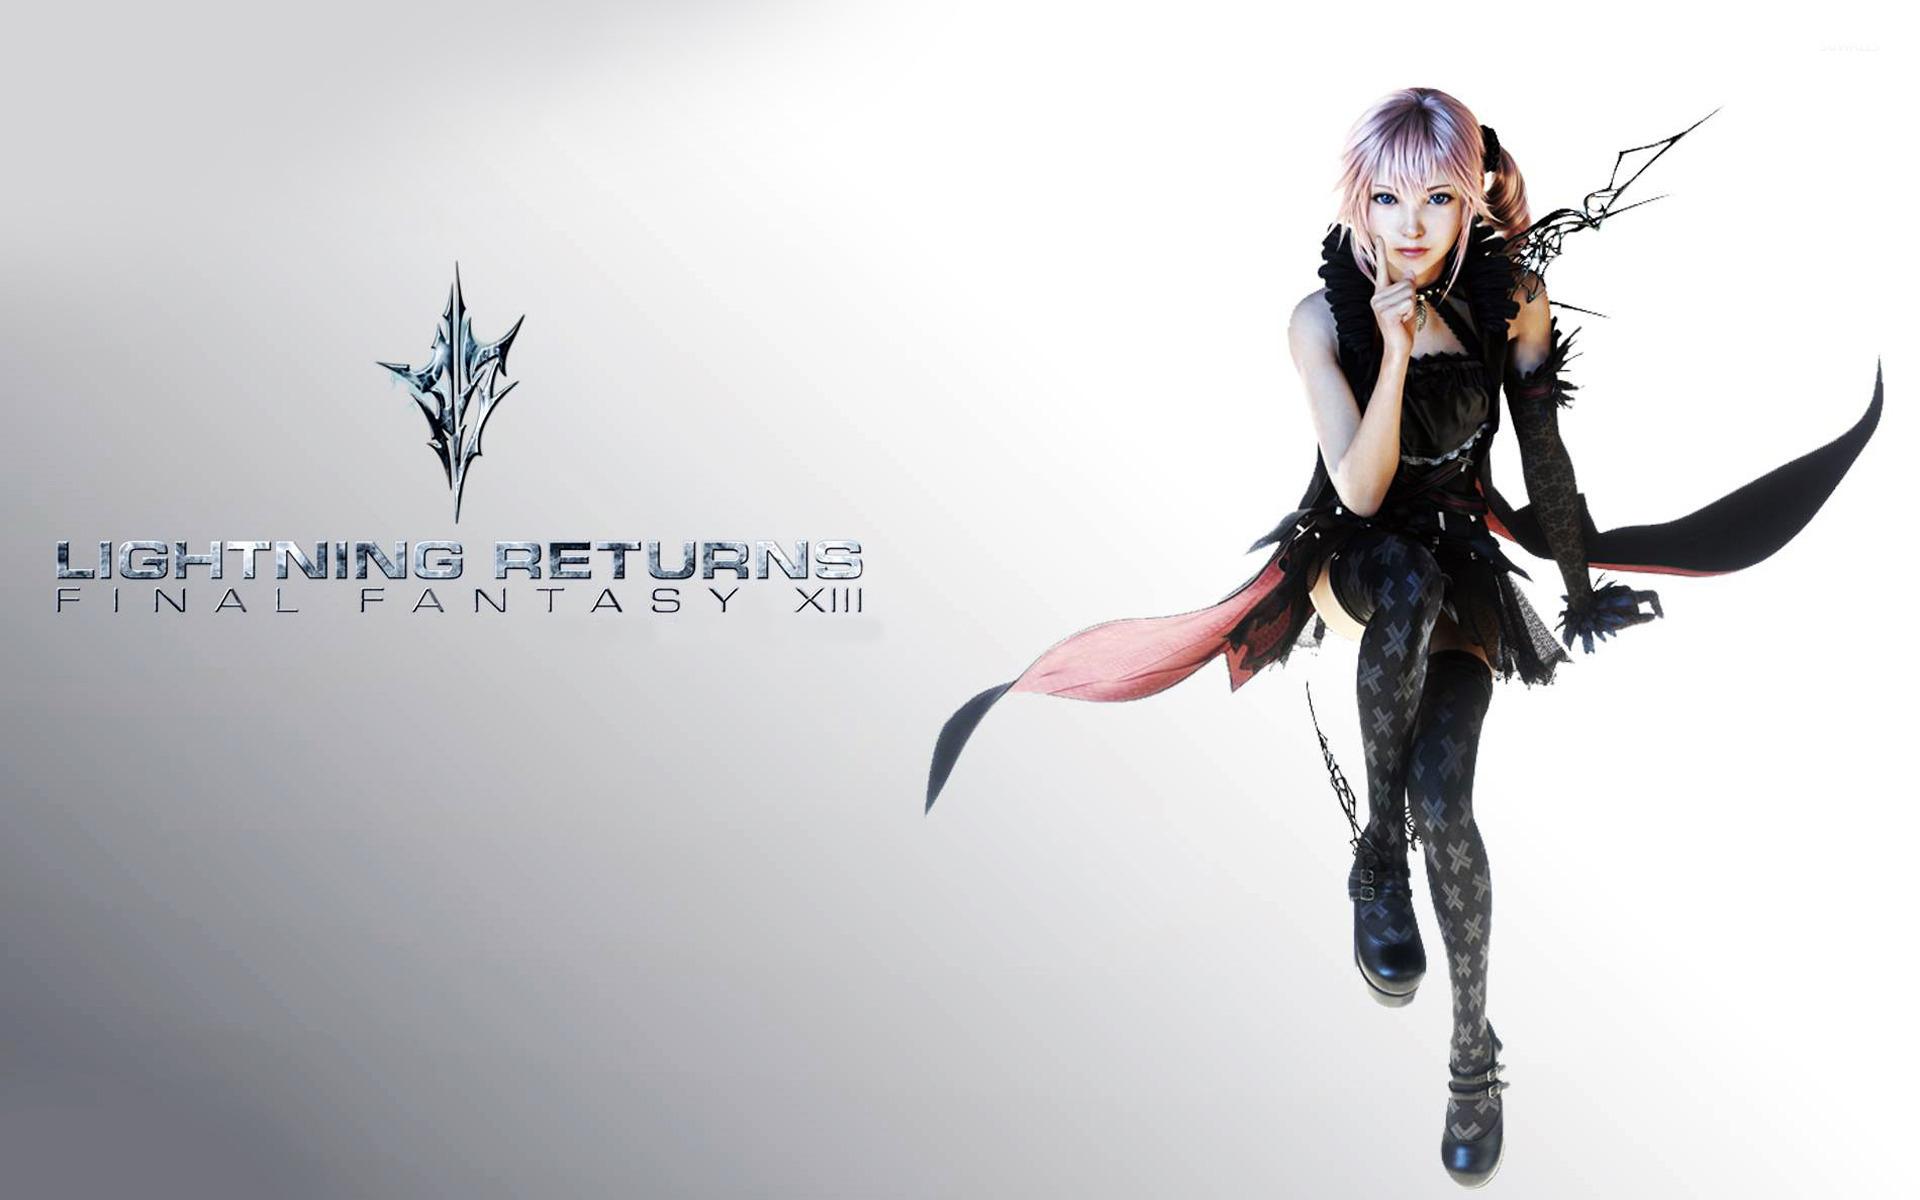 Lightning Returns Final Fantasy Xiii Wallpaper Game Wallpapers